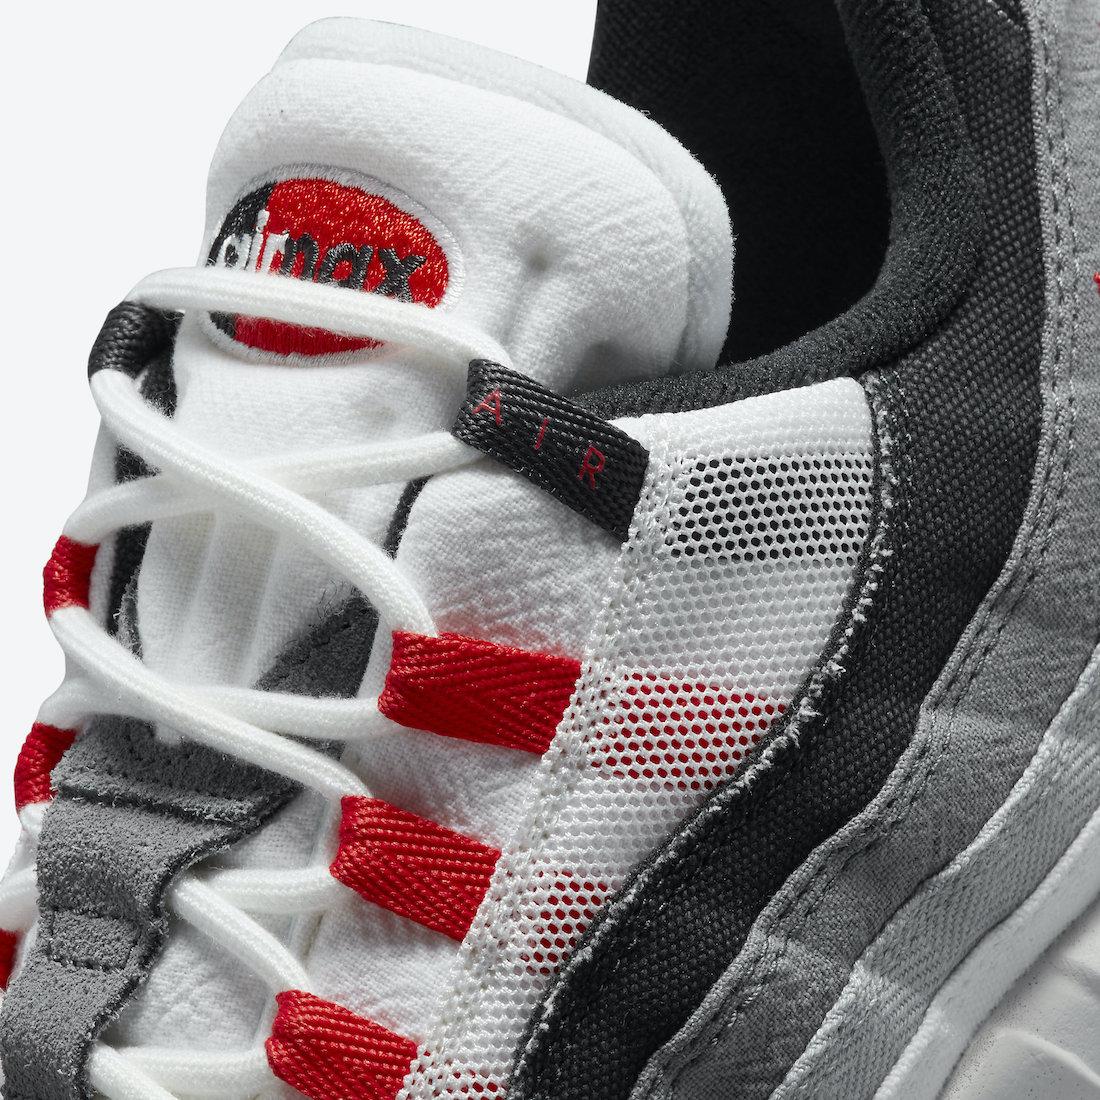 Nike-Air-Max-95-Japan-DH9792-100-Release-Date-8